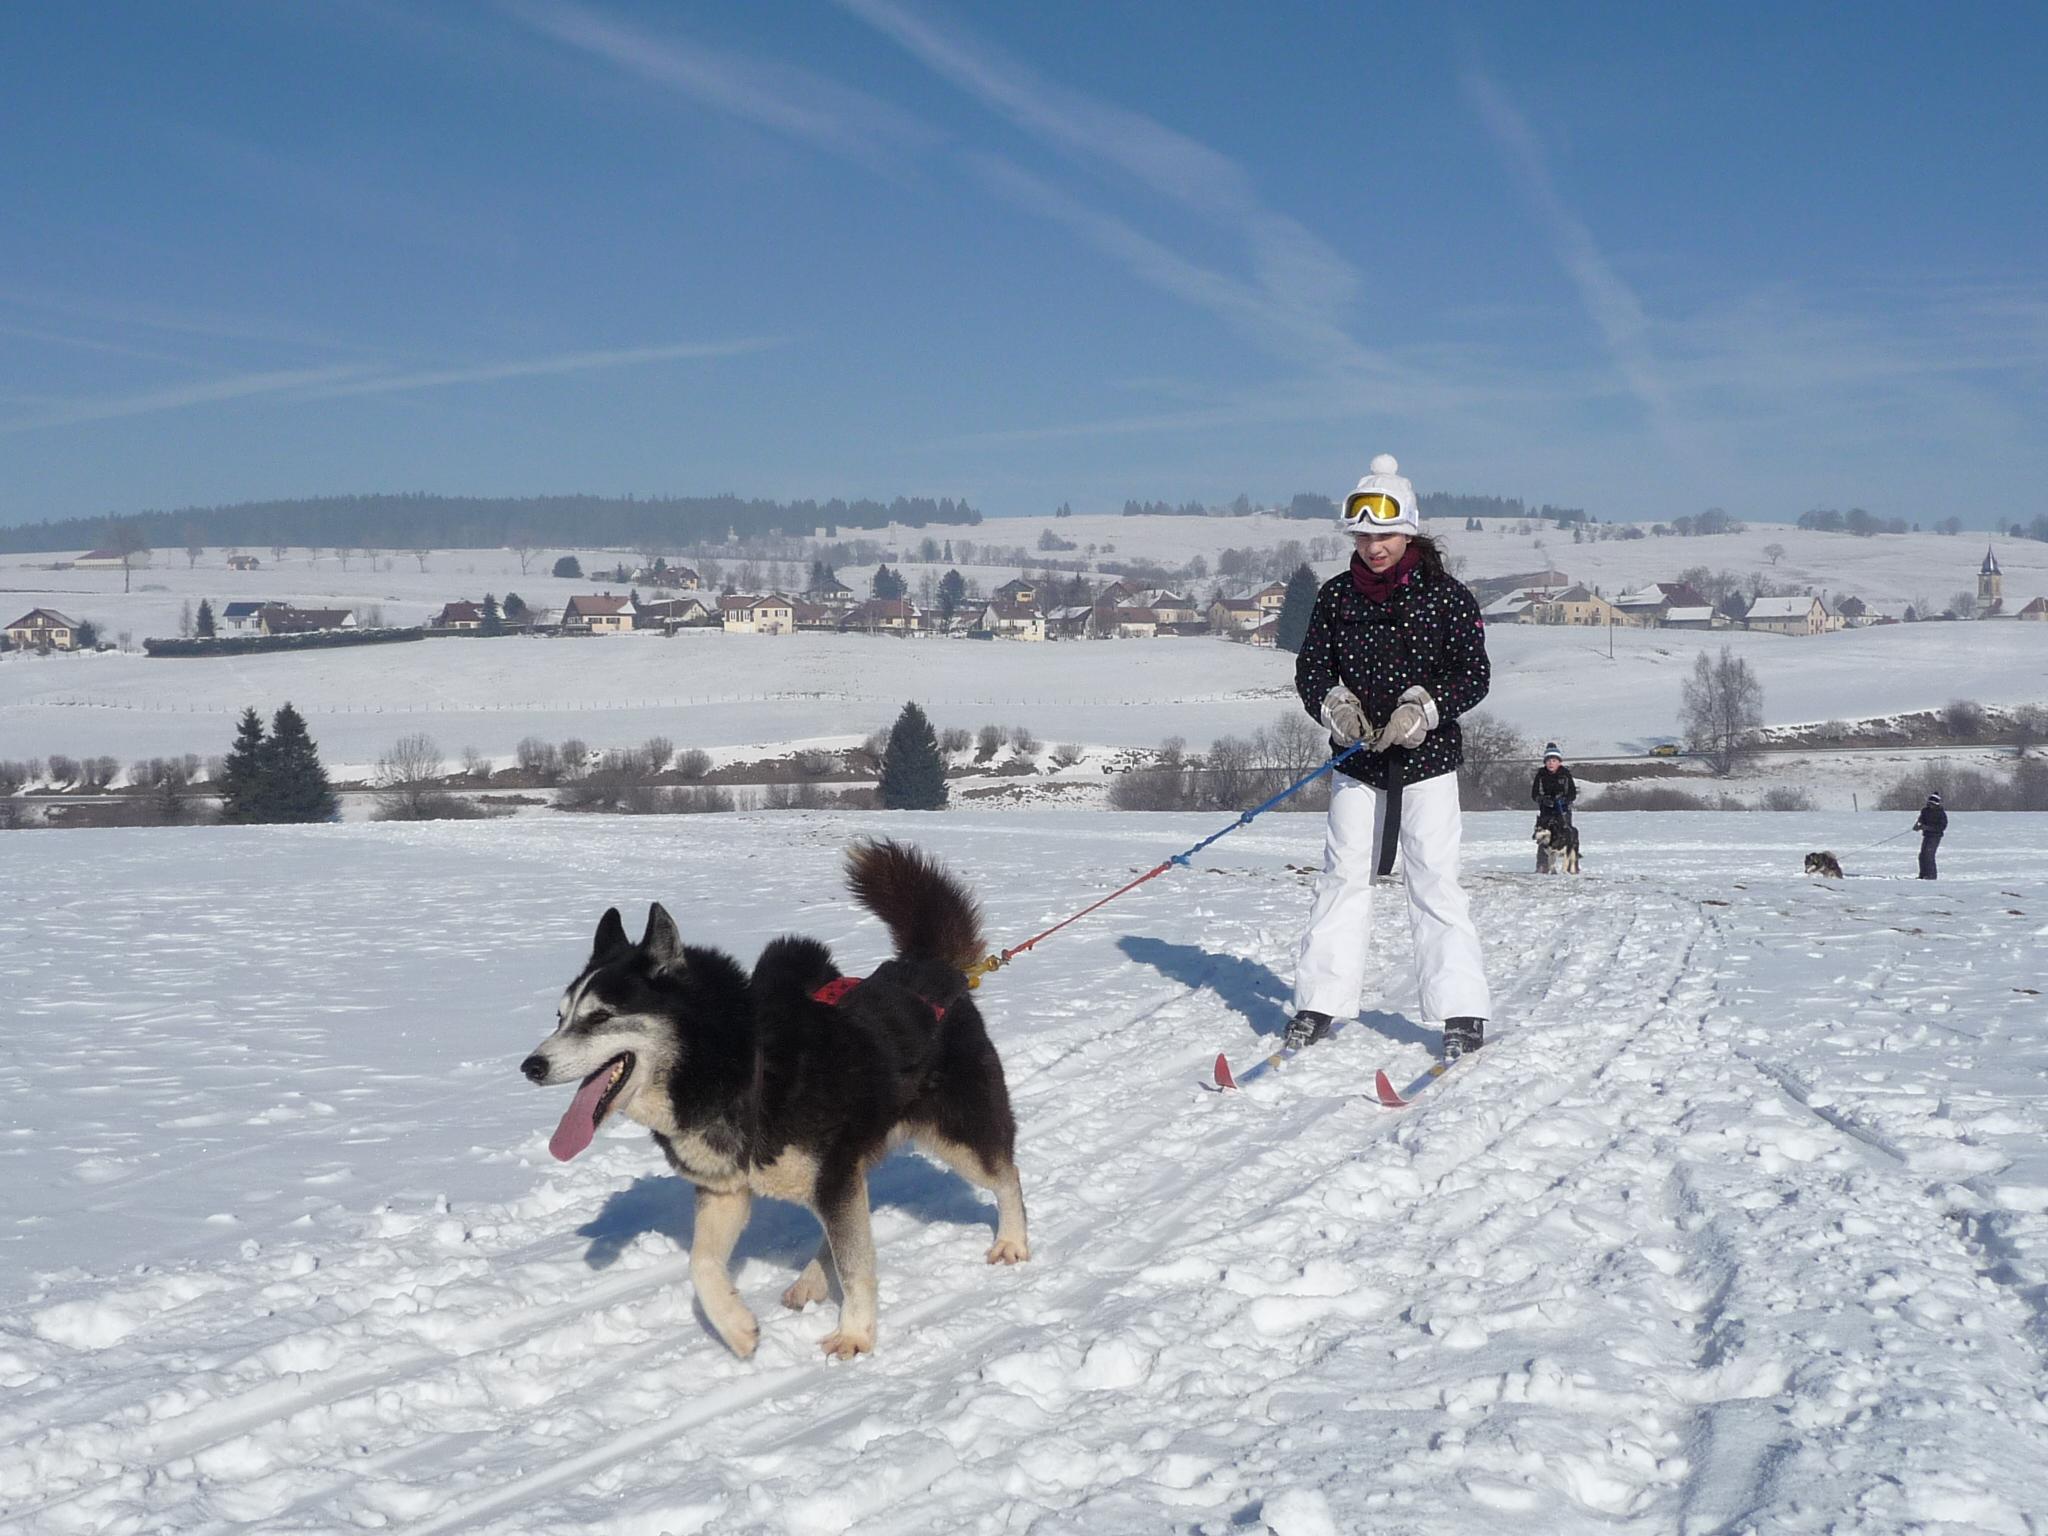 Udson ski joëring